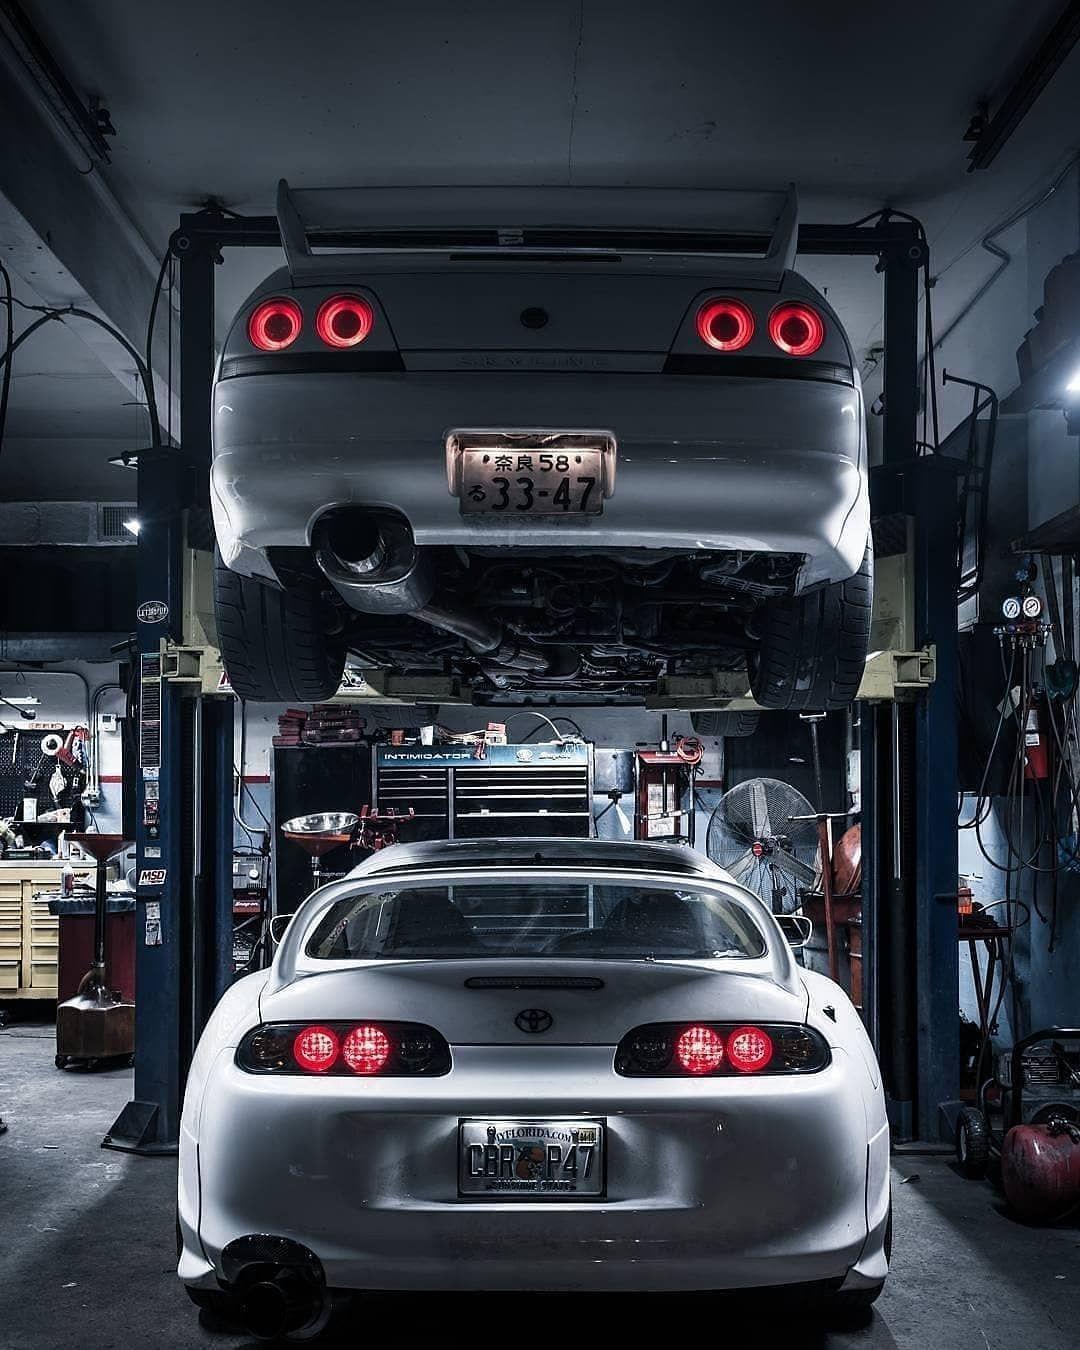 Top Or Bottom R34 Skyline Gtr R33 Toyota Supra In 2020 Nissan Gtr Skyline Nissan Gtr Skyline Gtr